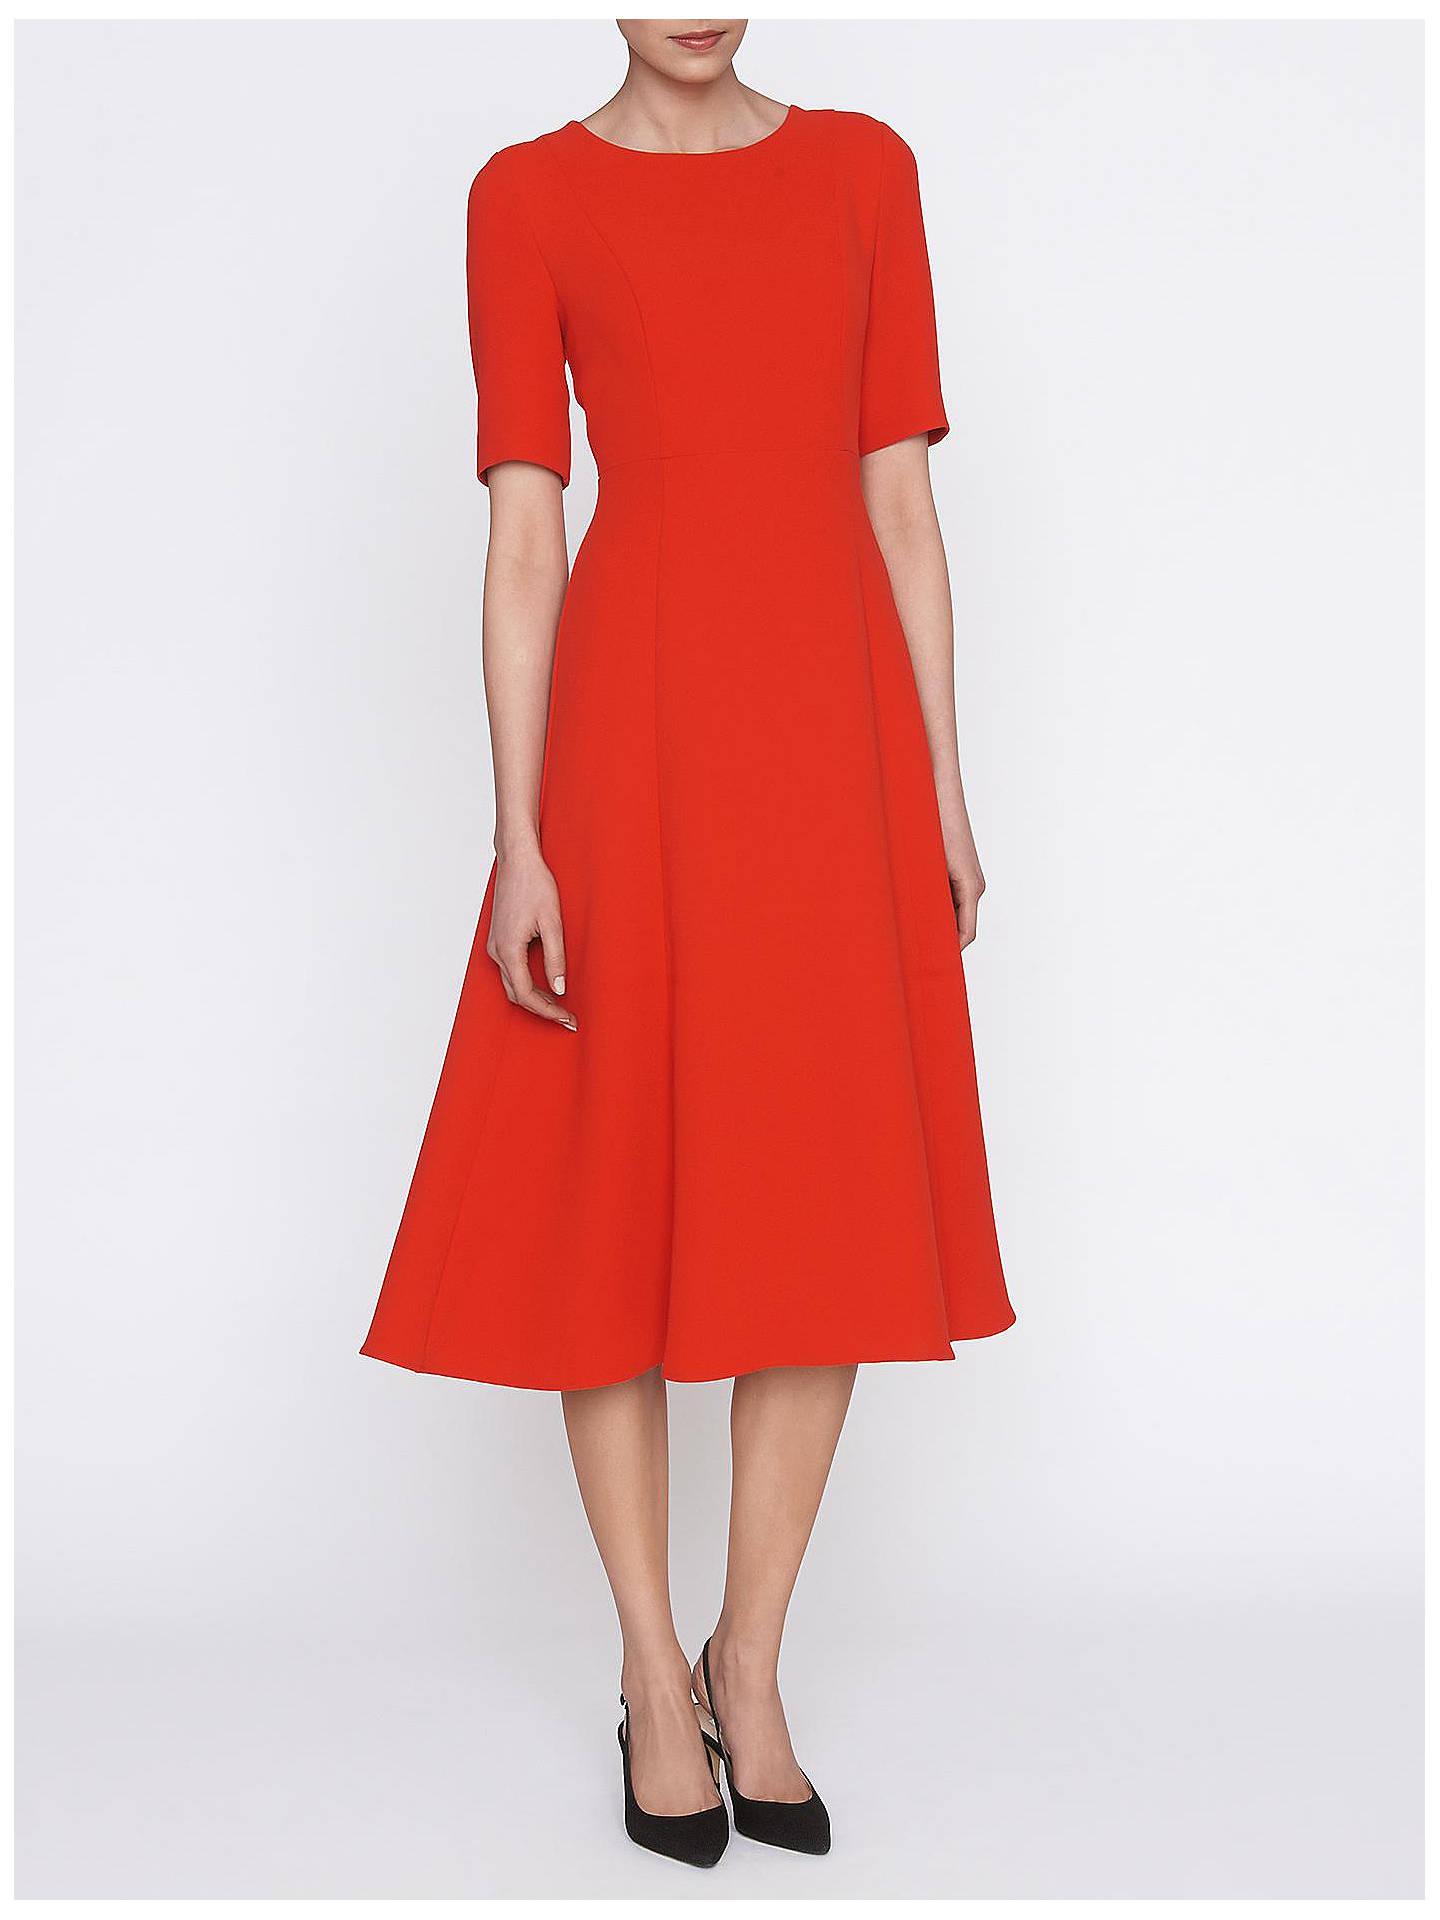 L K Bennett Cayla Long Dress At John Lewis Partners